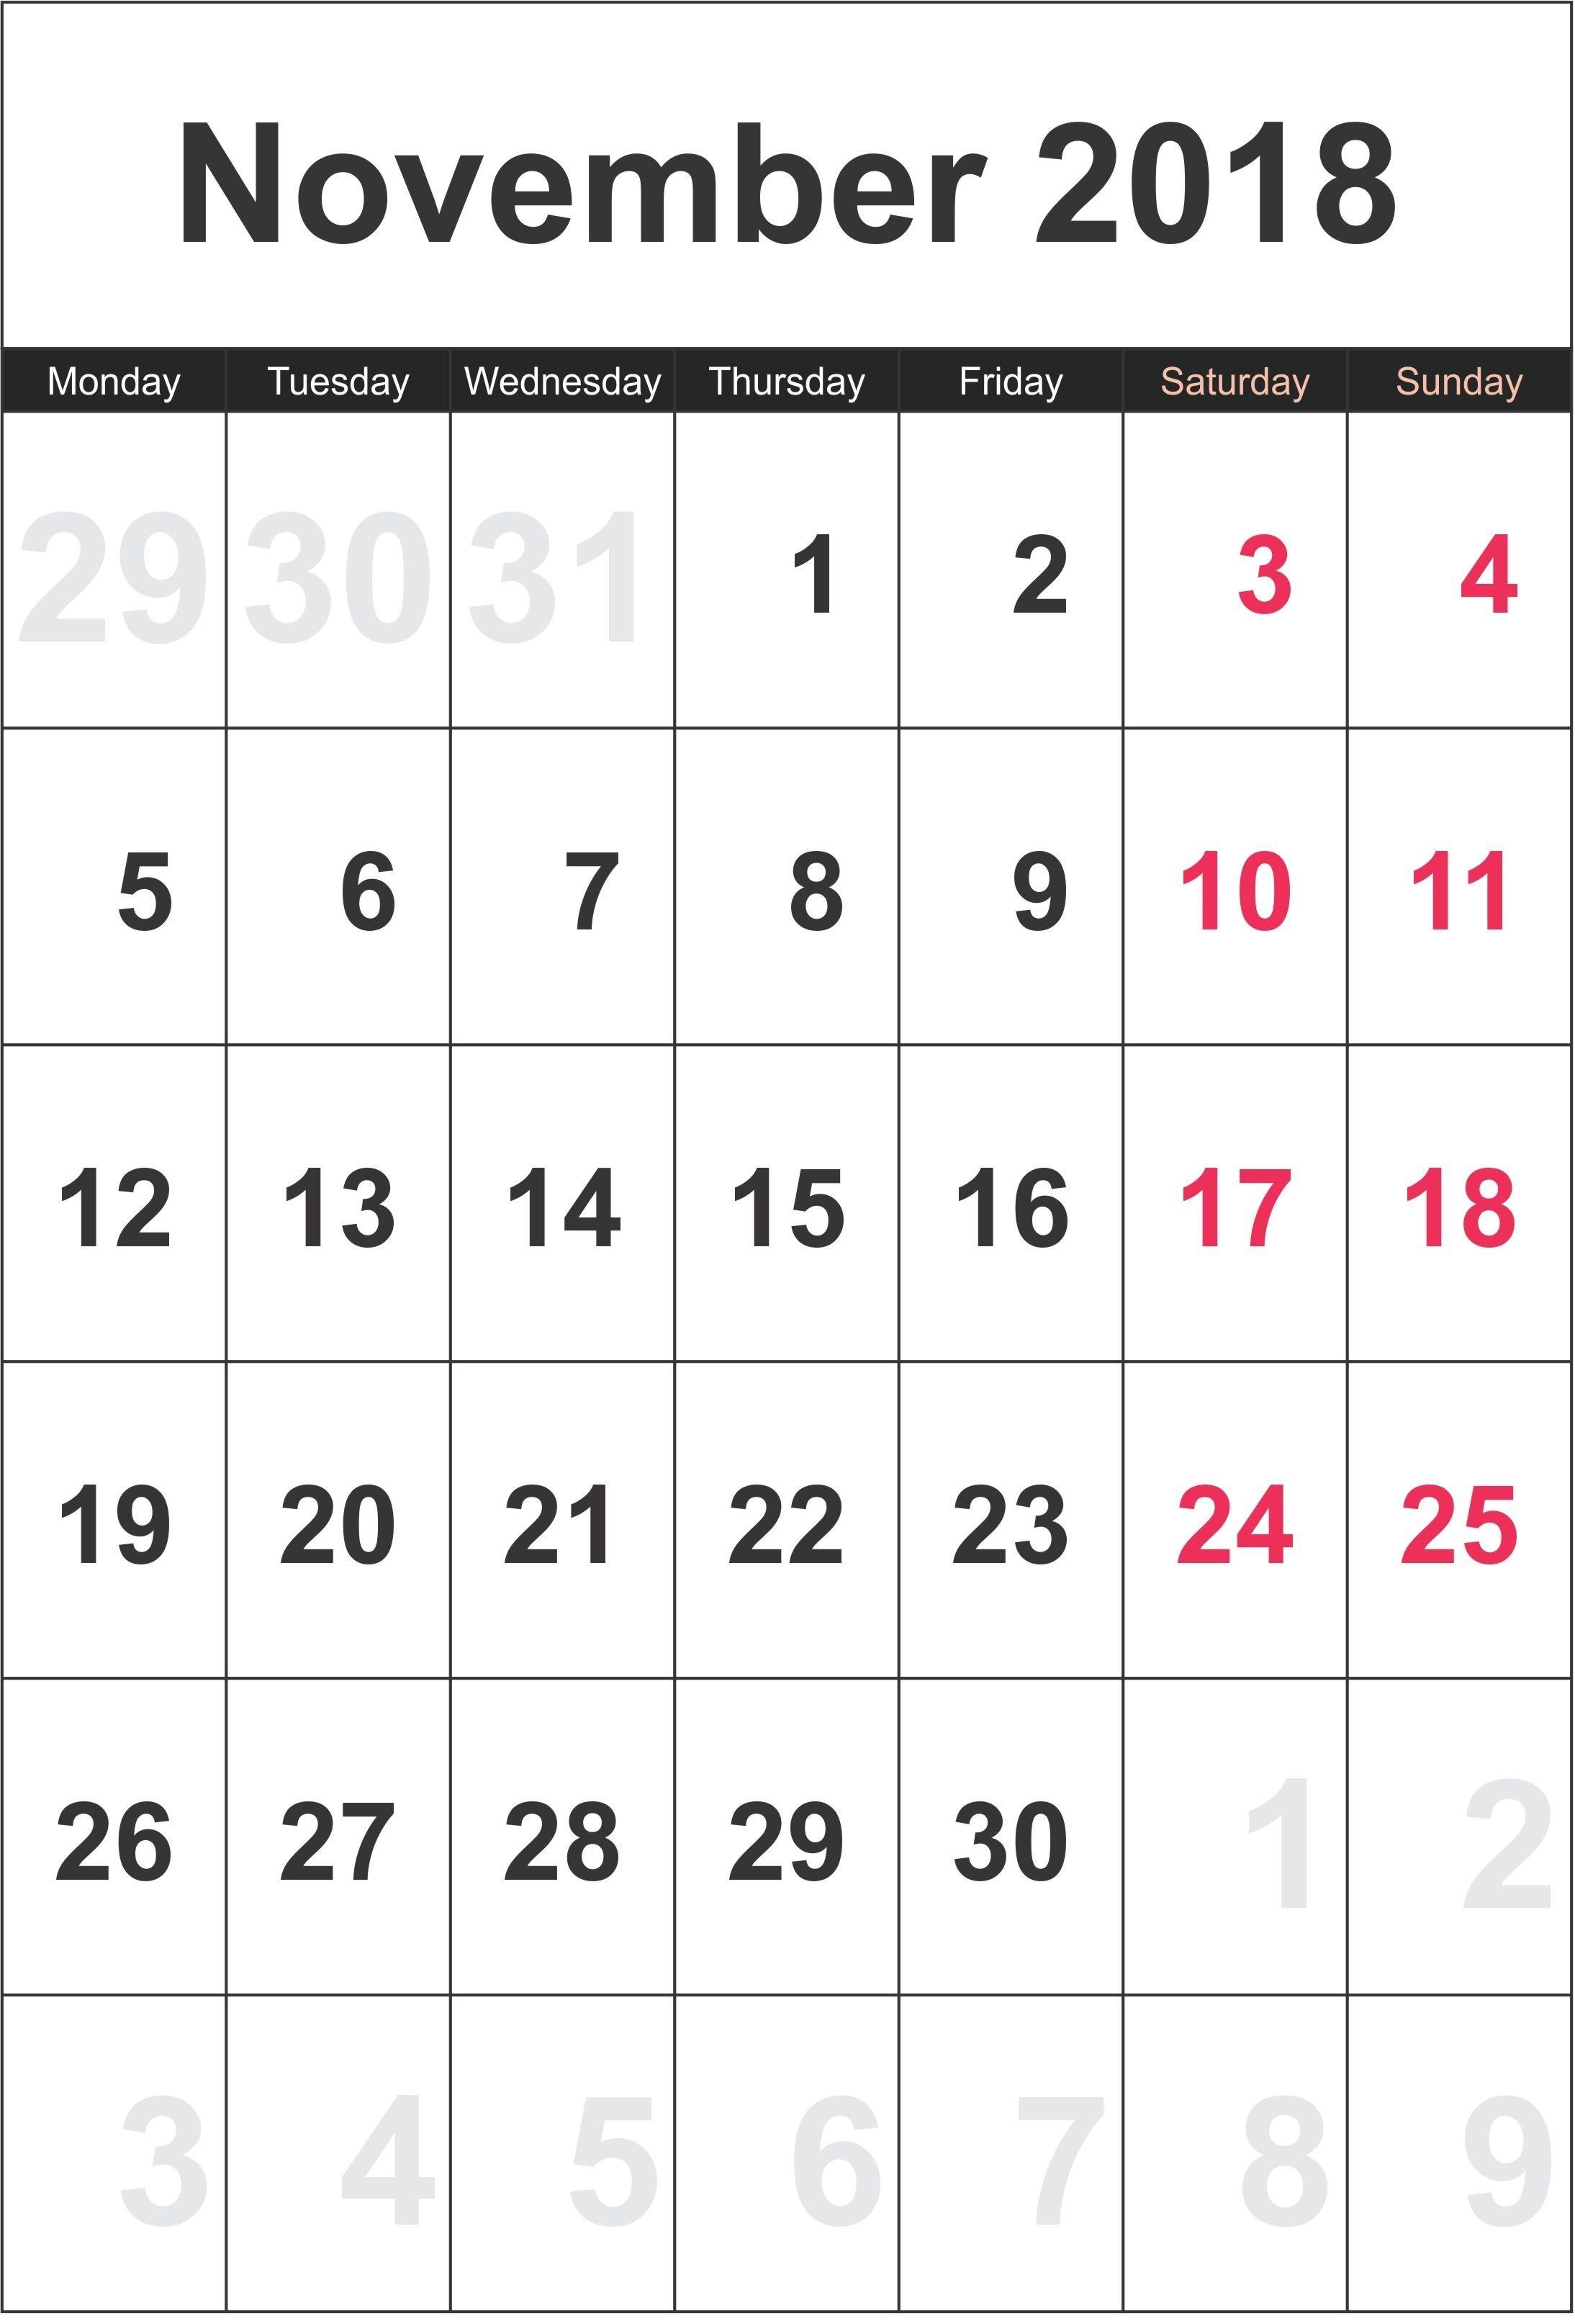 Free Printable Monthly Calendar 2019 Australia  Australia within 2018 Calendar Australia Printable